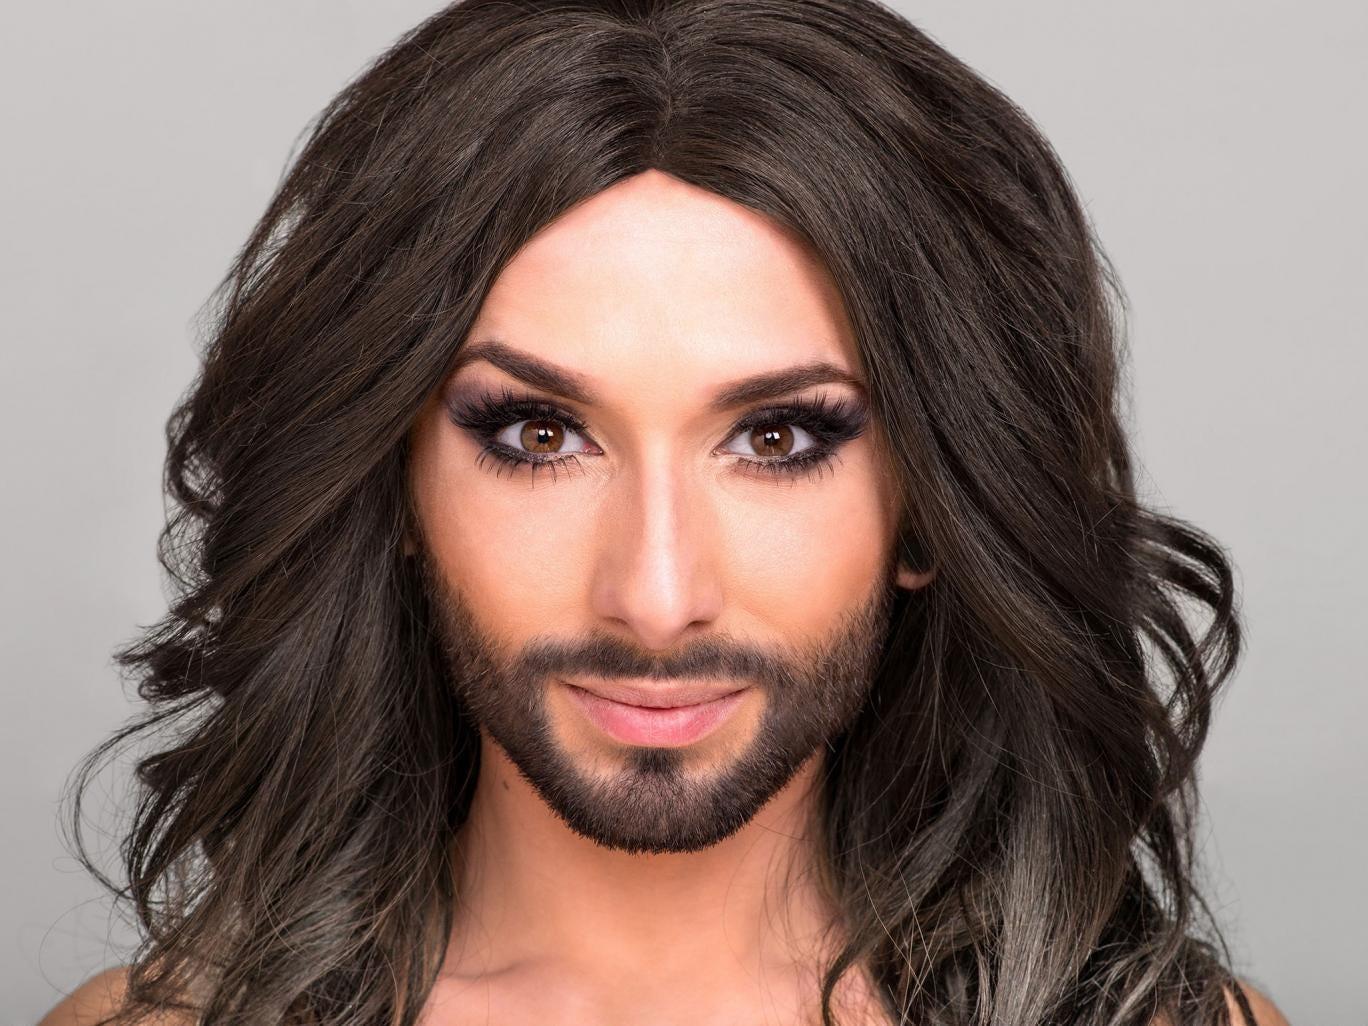 Conchita Wurst is Austria's entry for Eurovision 2014